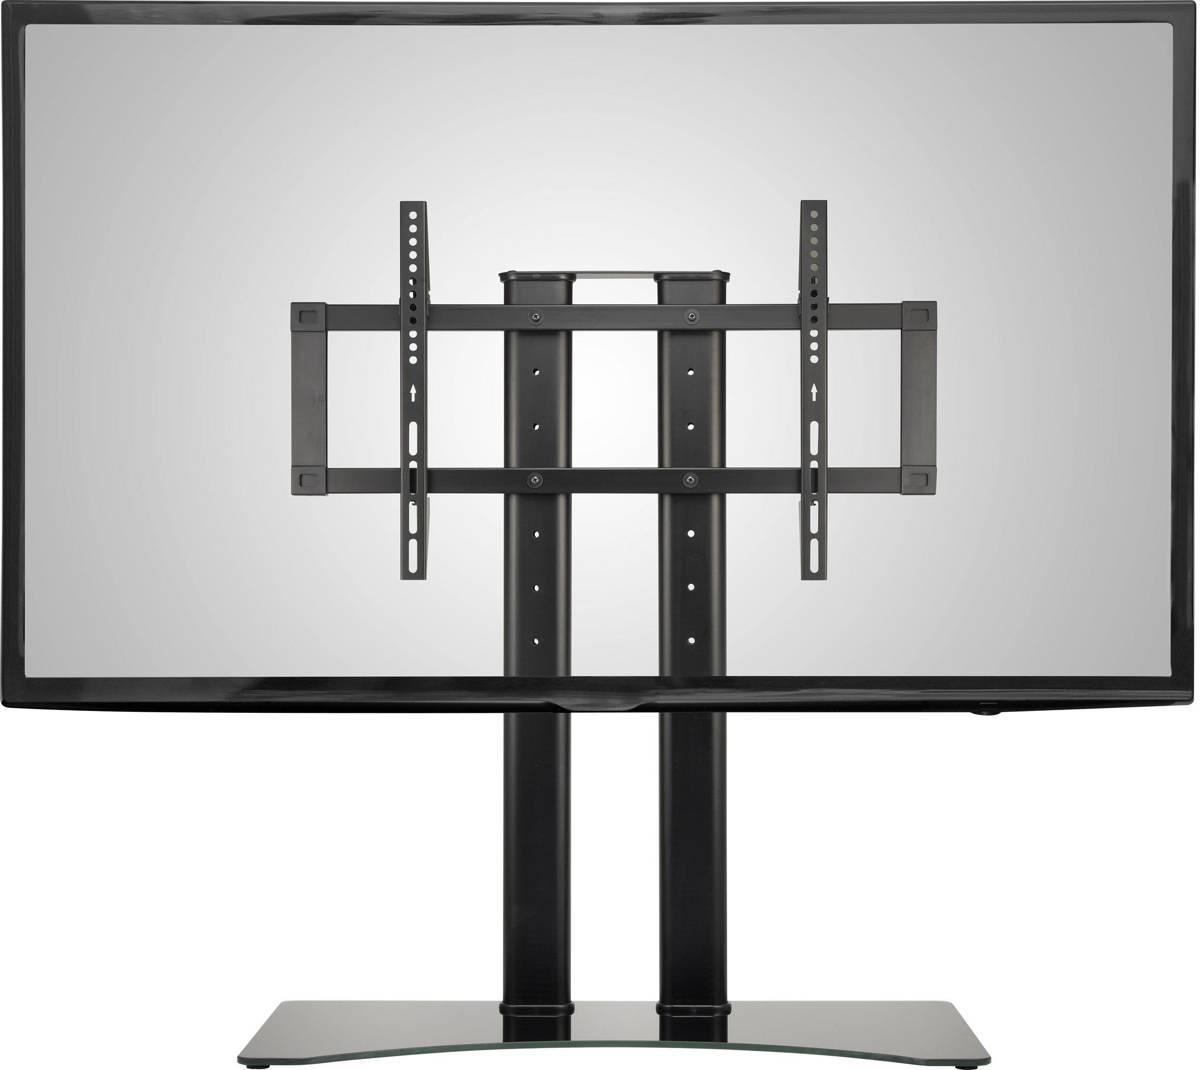 "SpeaKa Professional SP-TT-03 TV-voet 94,0 cm (37"") - 165,1 cm (65"") Vast kopen"